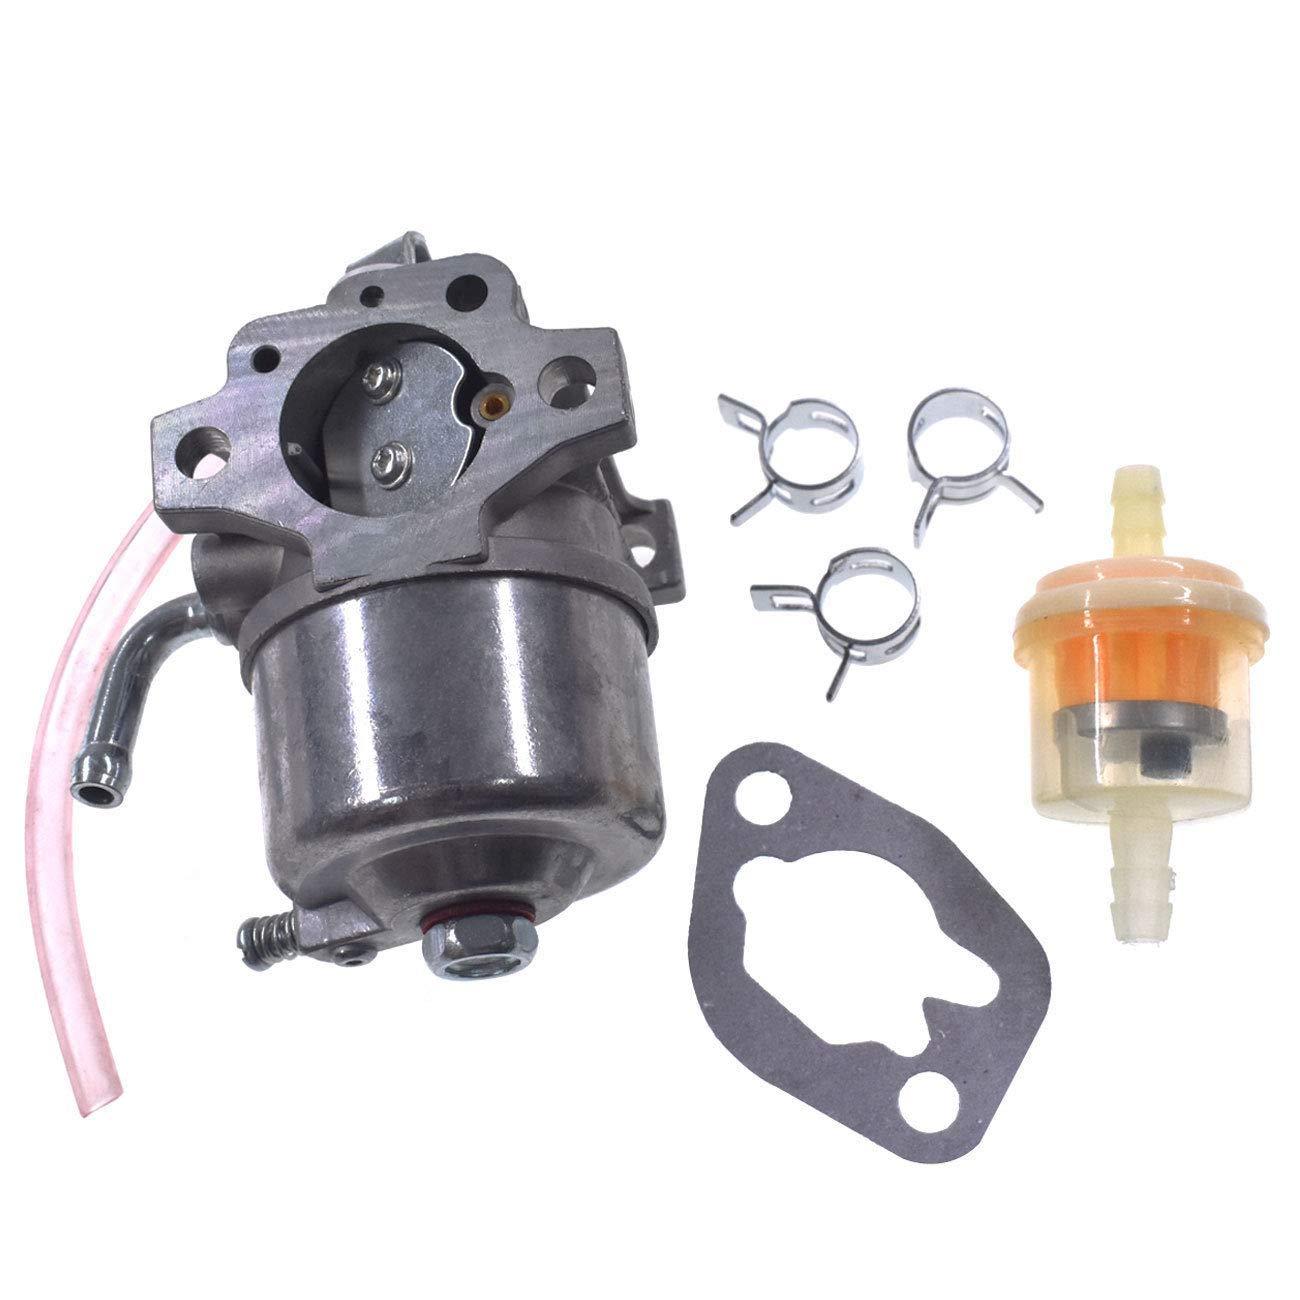 FidgetFidget Carburetor Fits for Kawasaki FC150V 4 Stroke 14SB Mower Carb